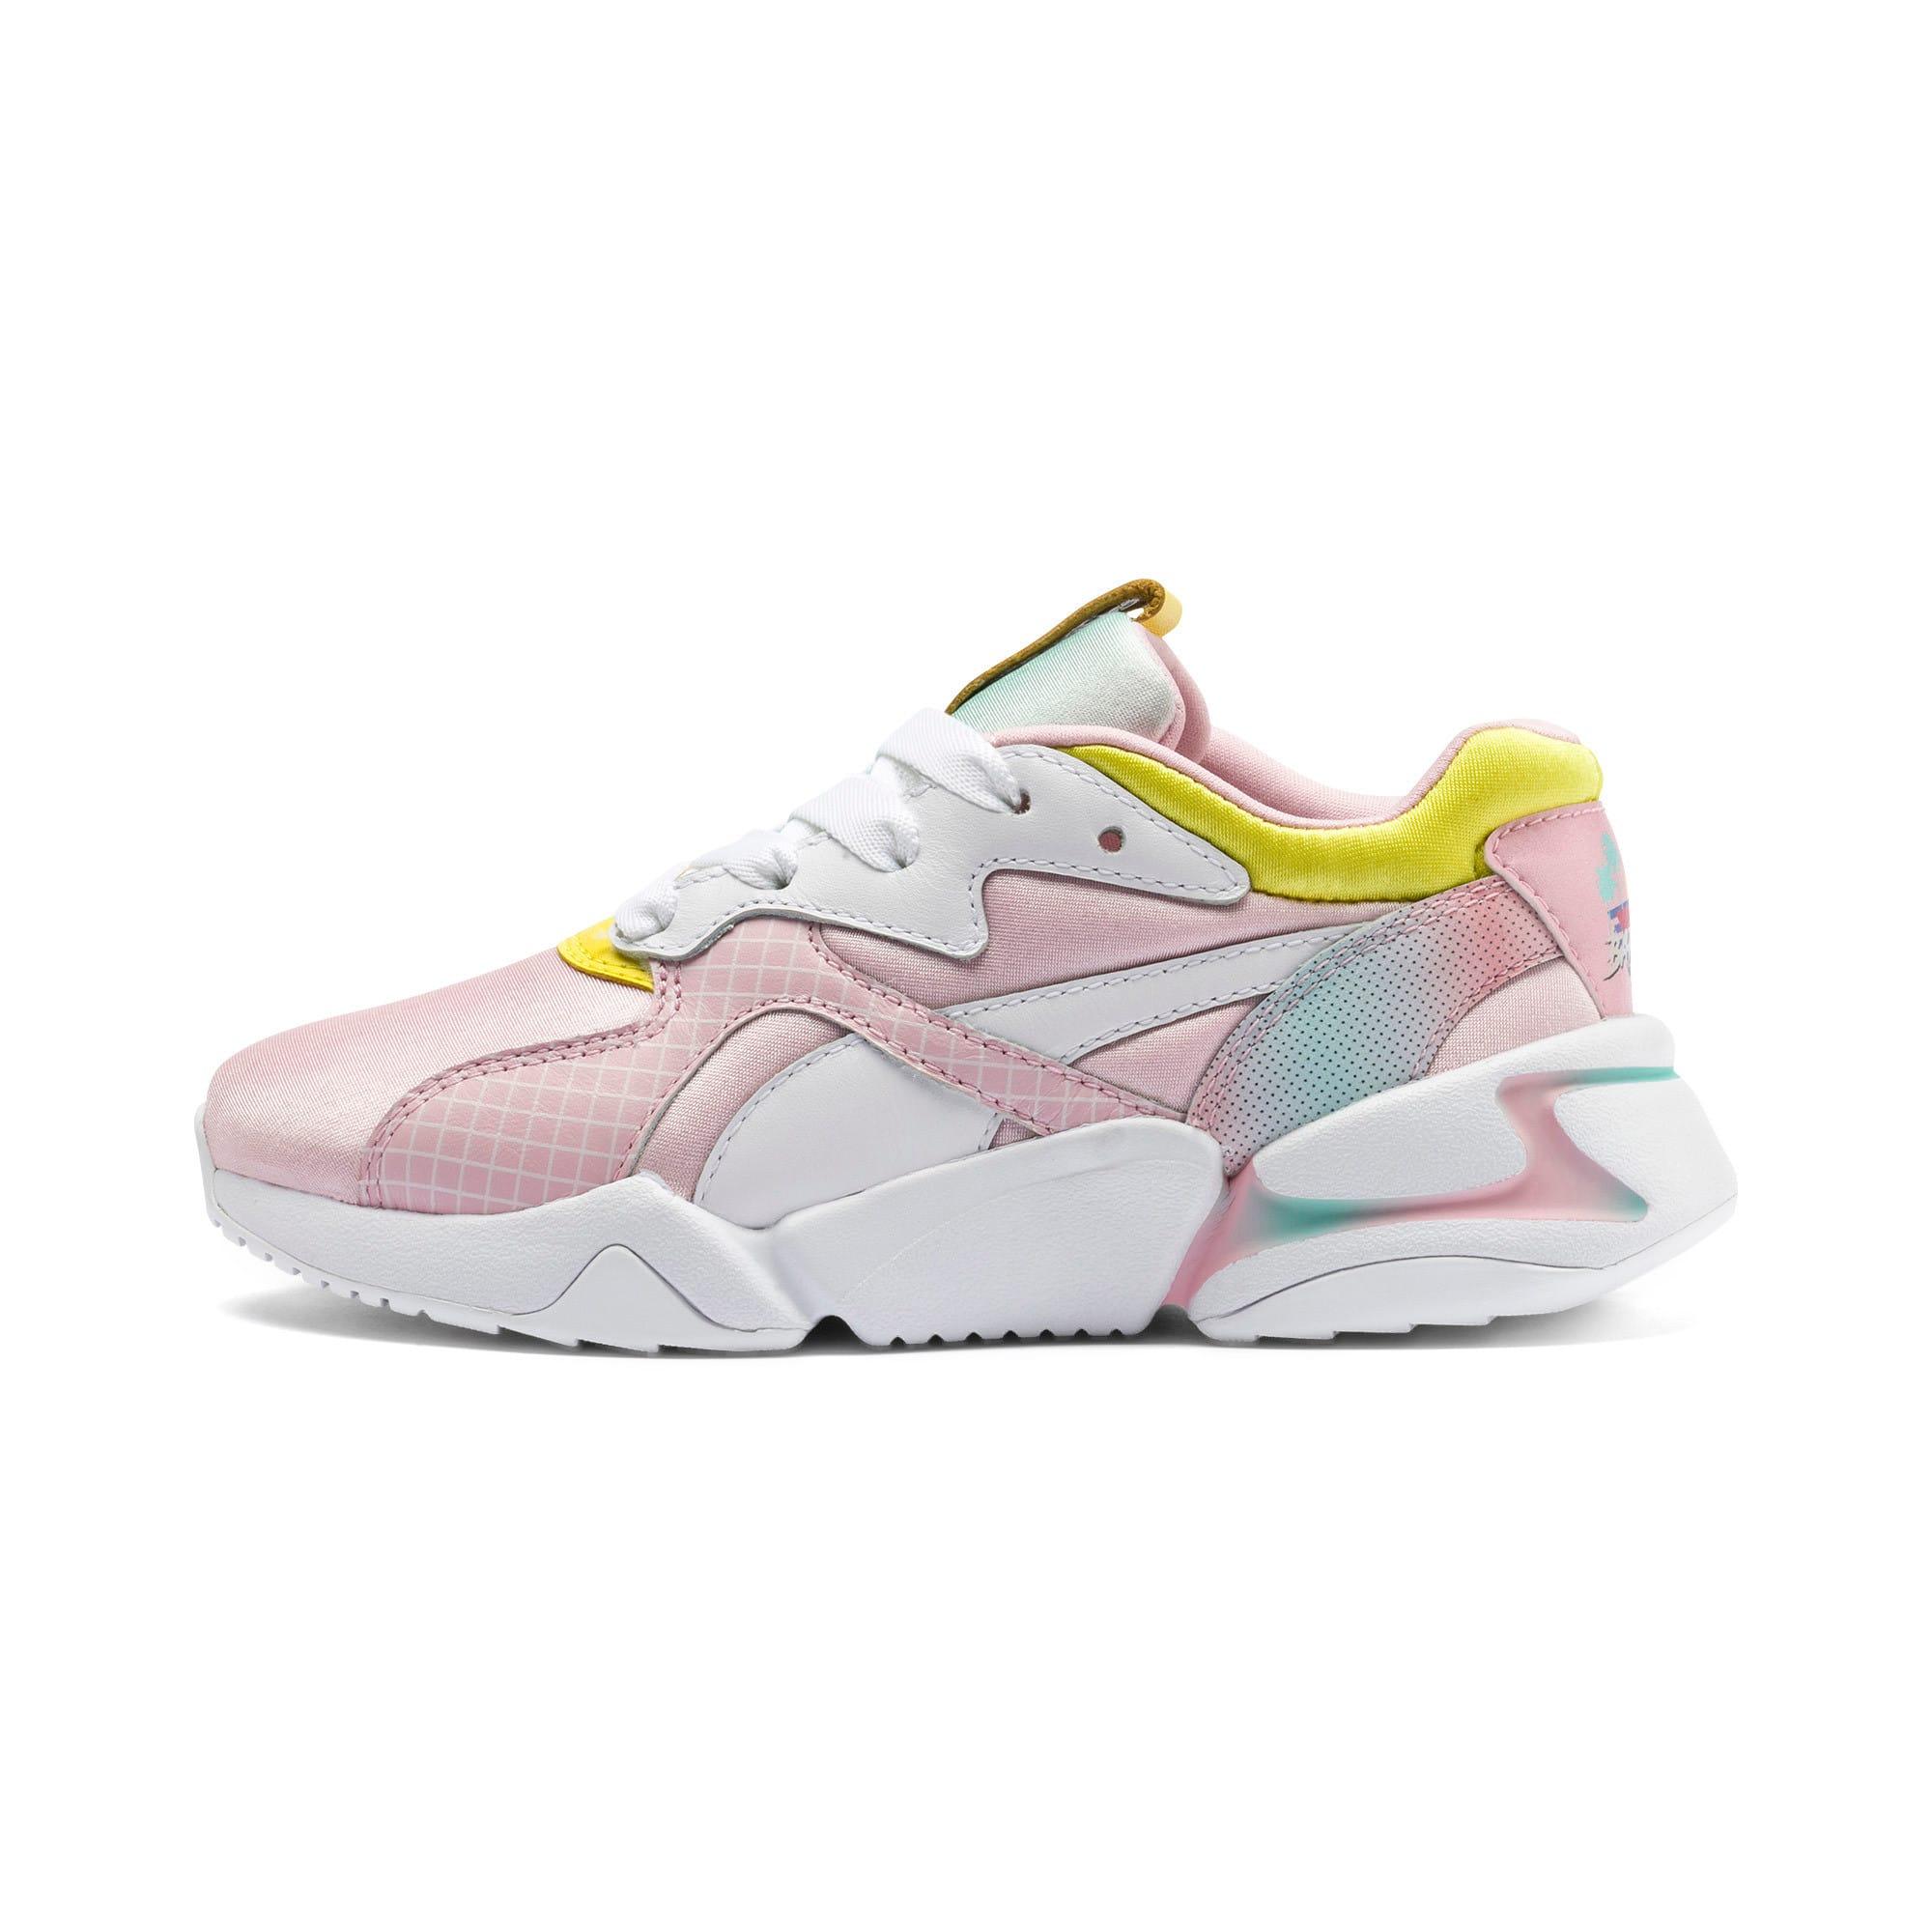 Thumbnail 1 of Nova x Barbie Little Kids' Shoes, Orchid Pink-Puma White, medium